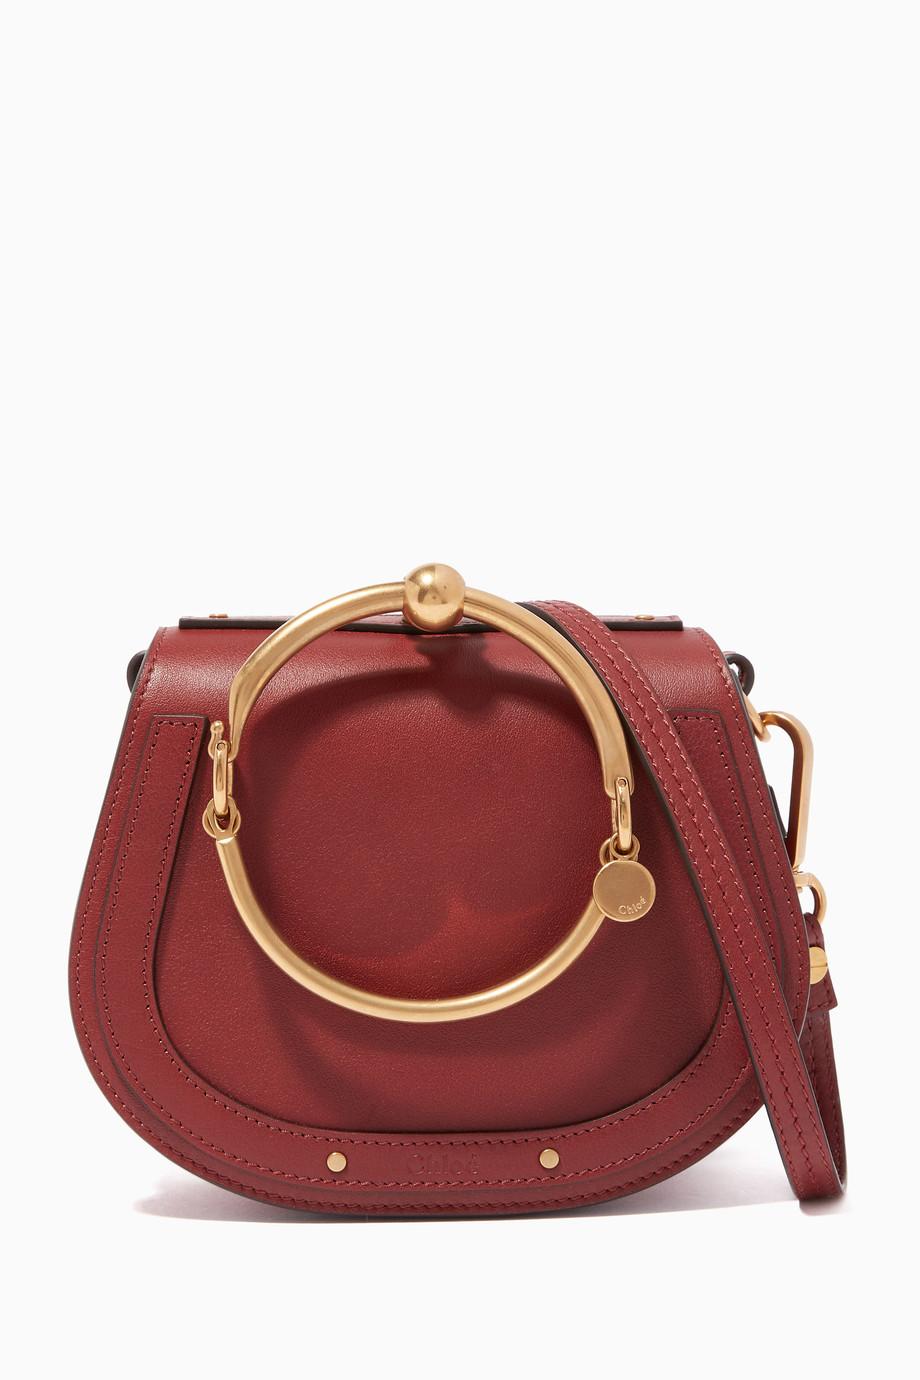 2028b8ca05ef4 Shop Chloé Red Sirenne Red Small Nile Bracelet Bag for Women | Ounass